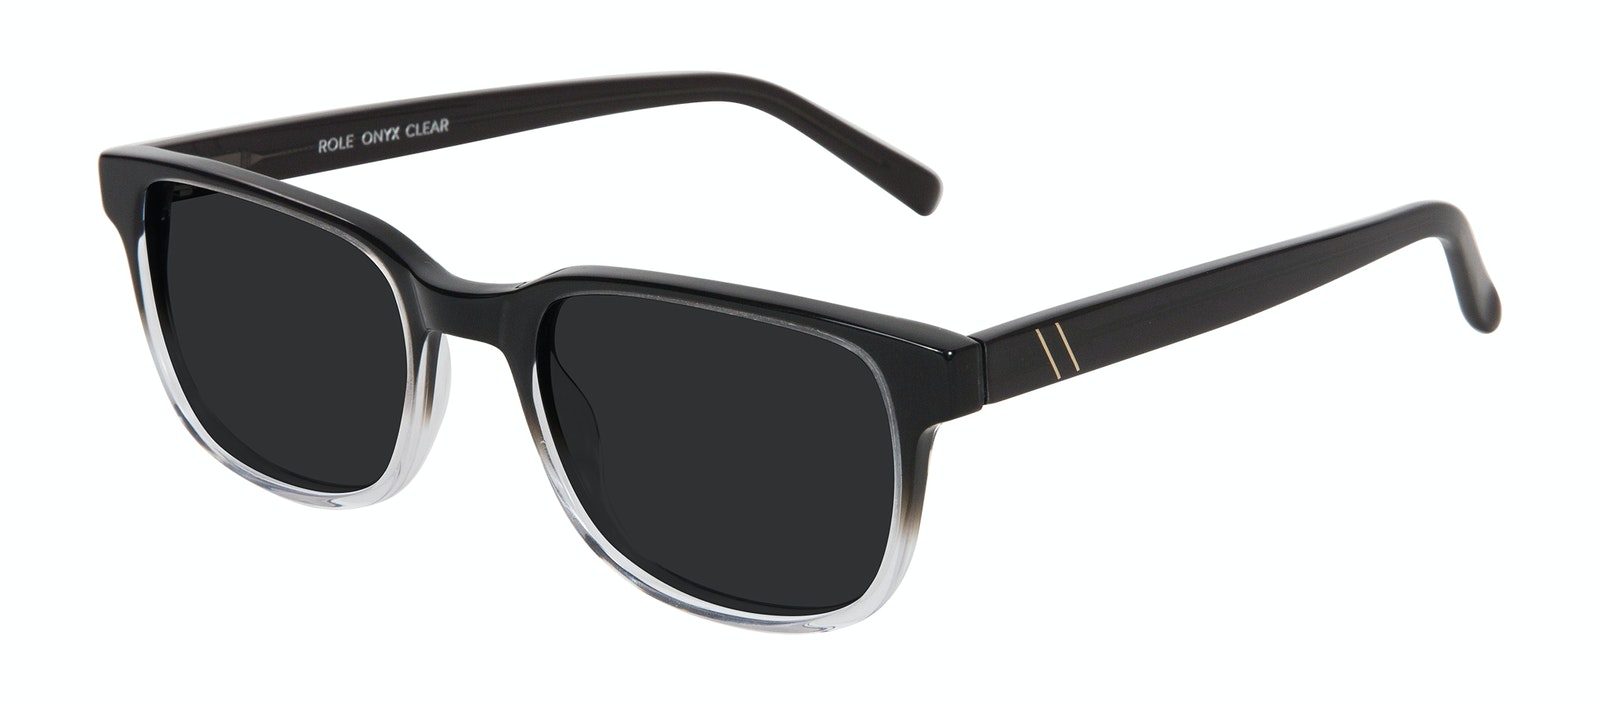 Affordable Fashion Glasses Square Sunglasses Men Role Onyx Clear Tilt